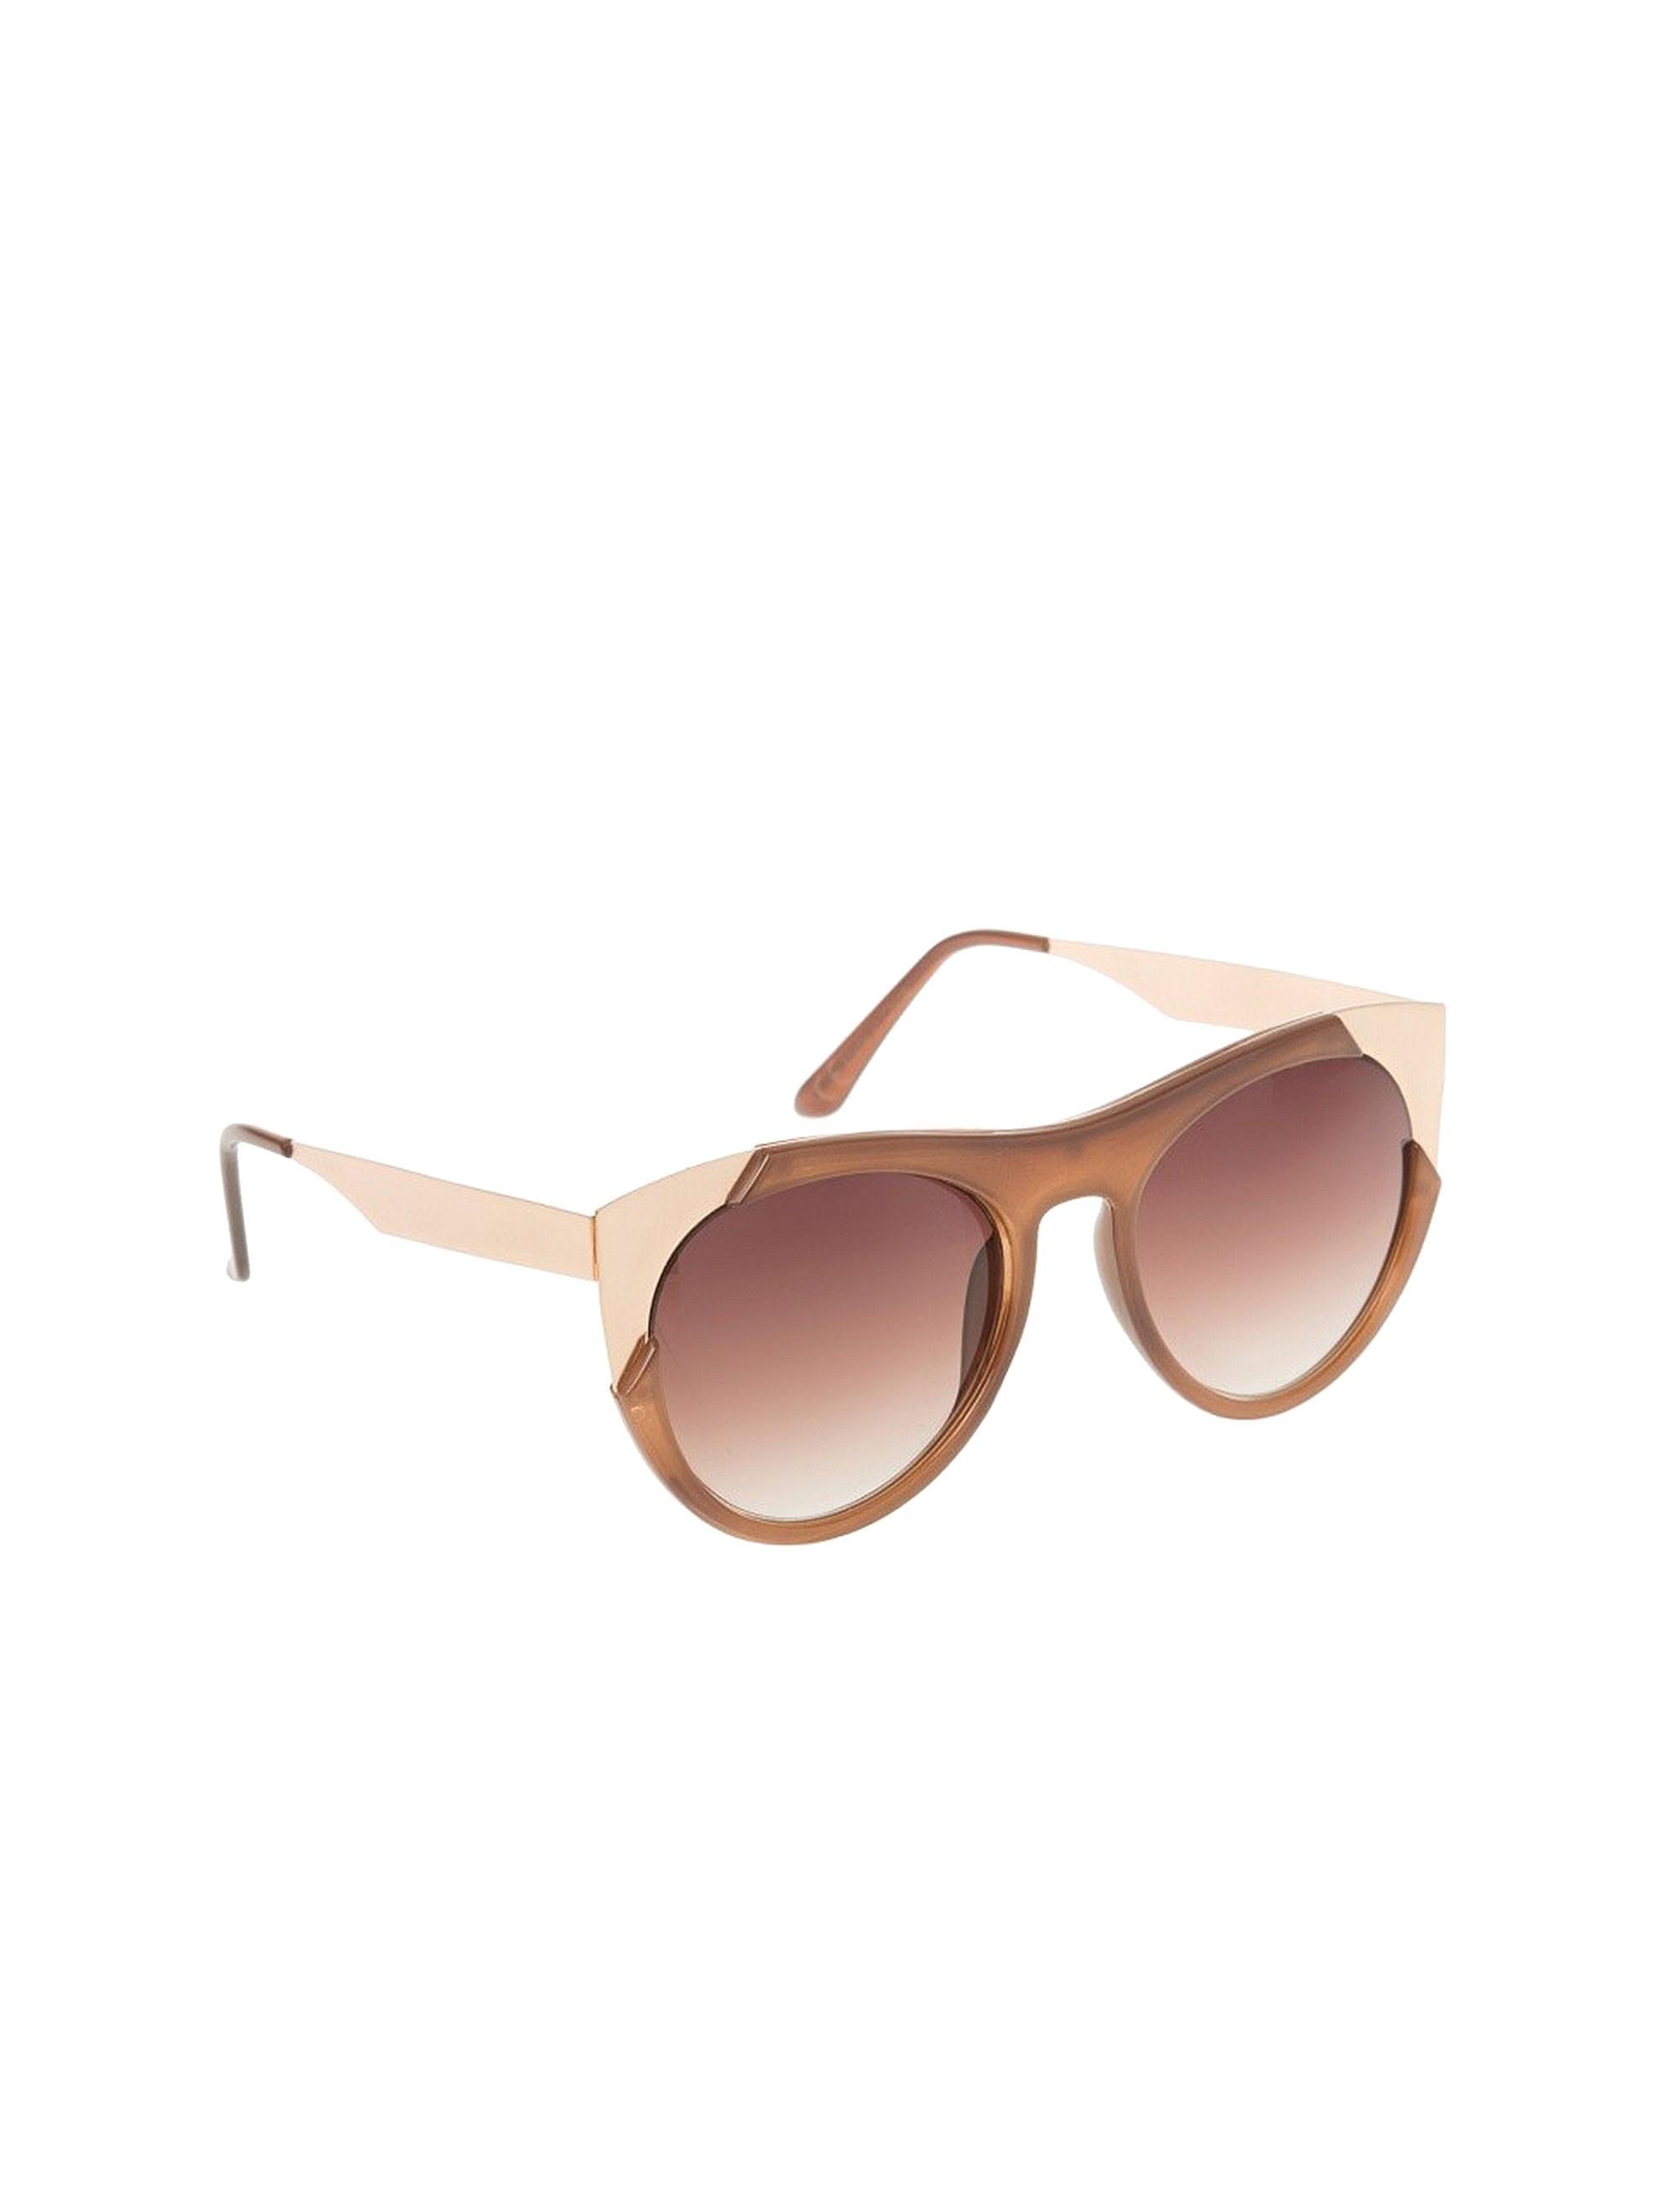 عینک آفتابی زنانه - پارفوا - صورتي - 1